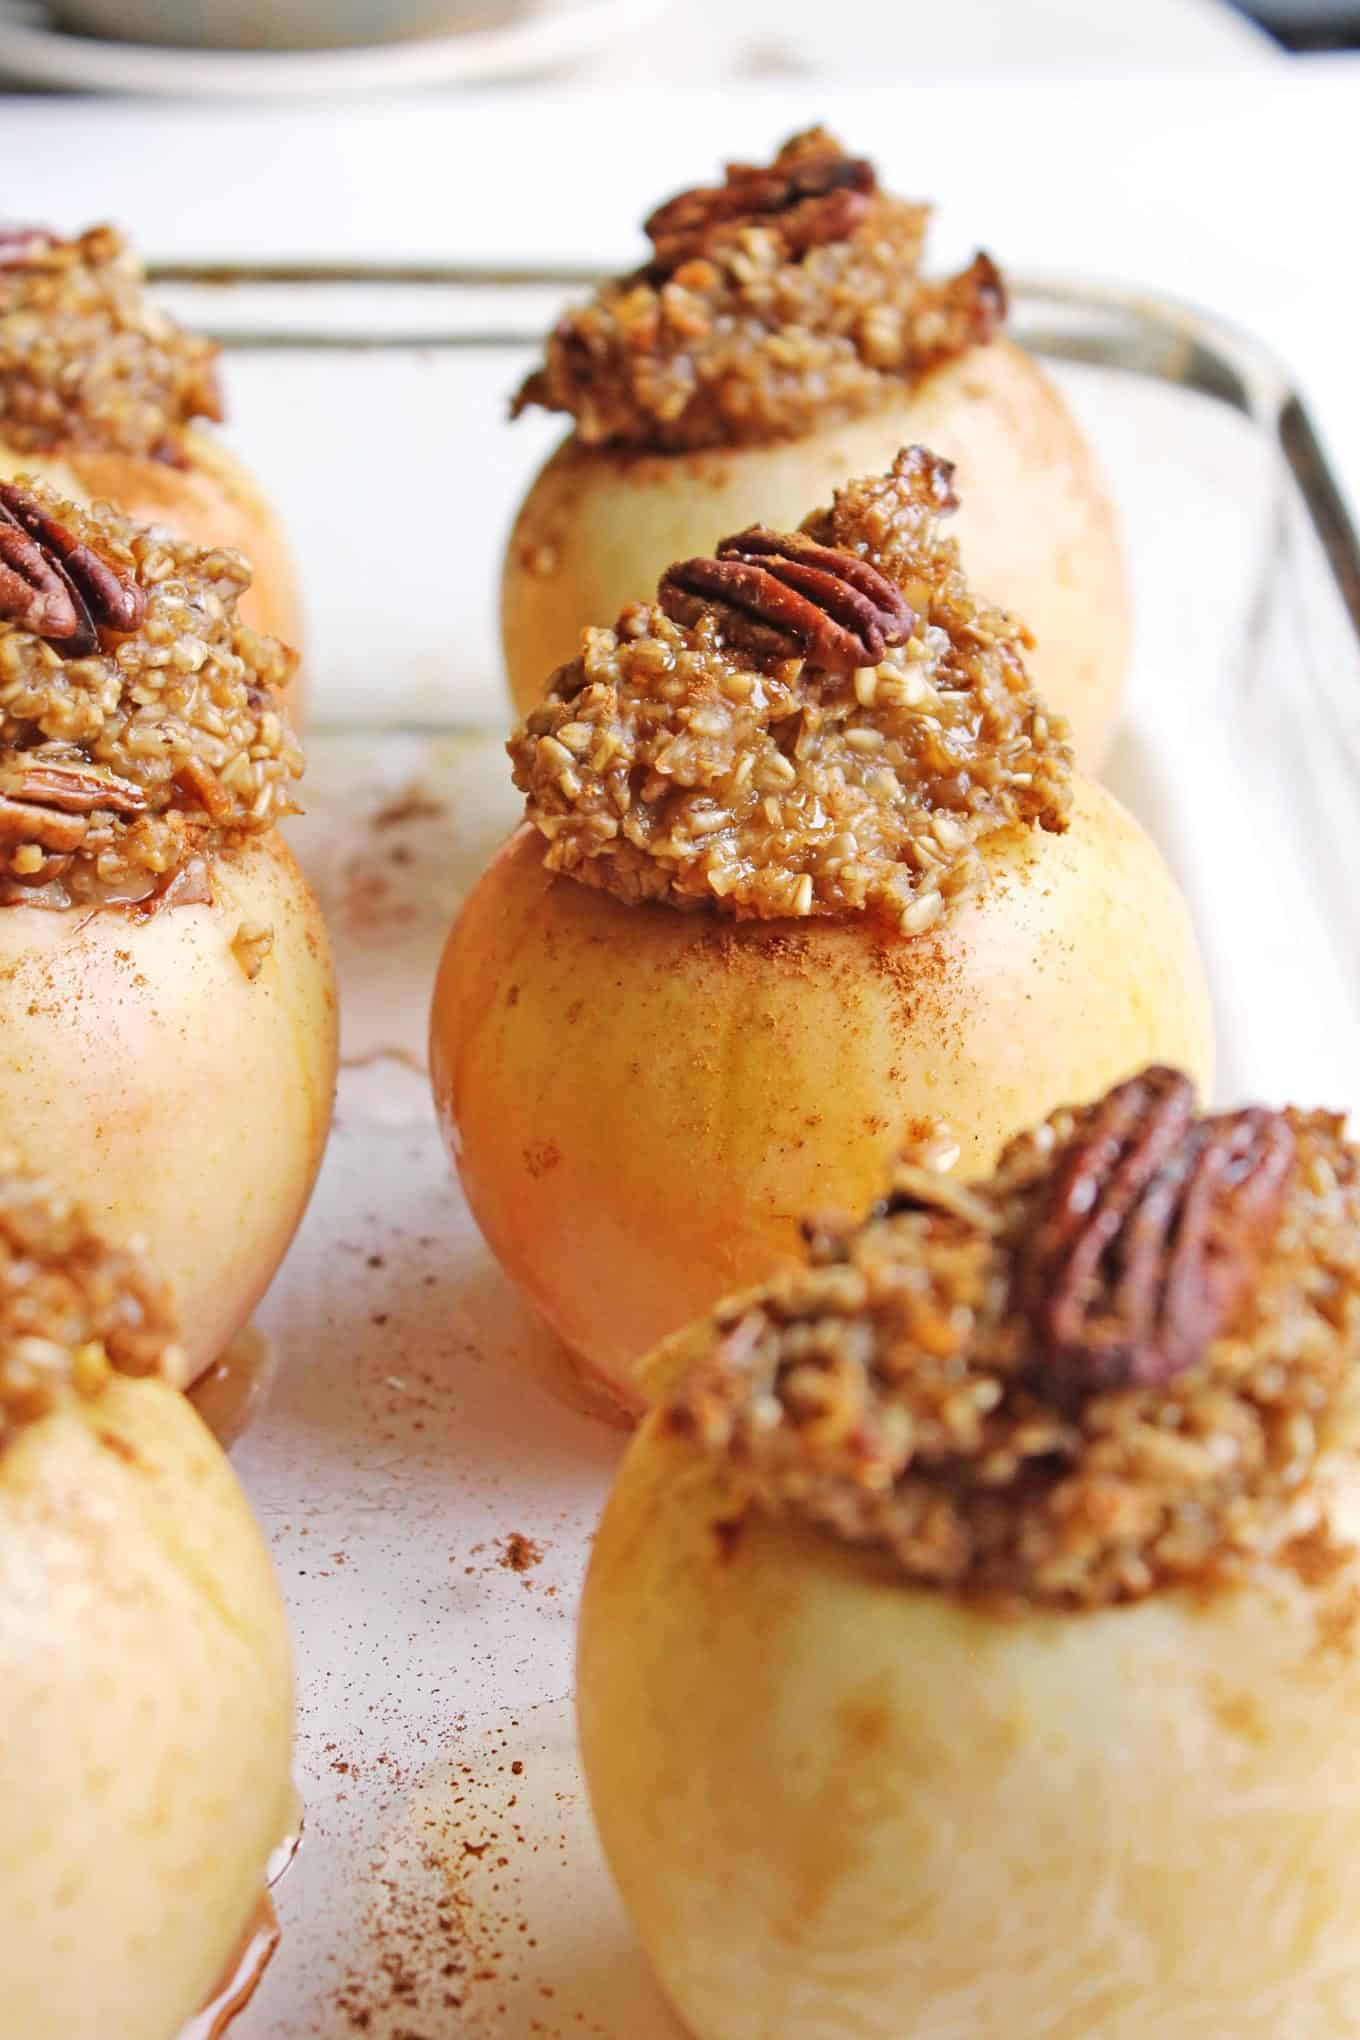 Oatmeal baked apples